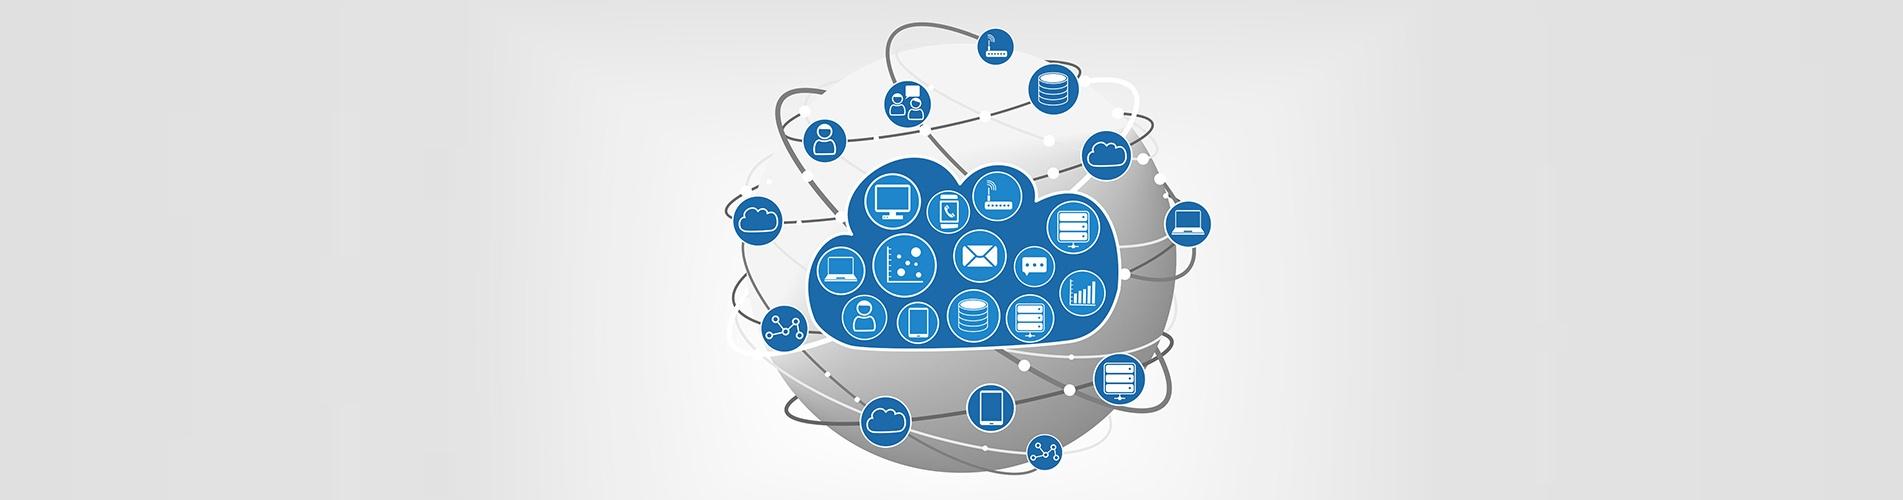 Cloud ibrido e compliance